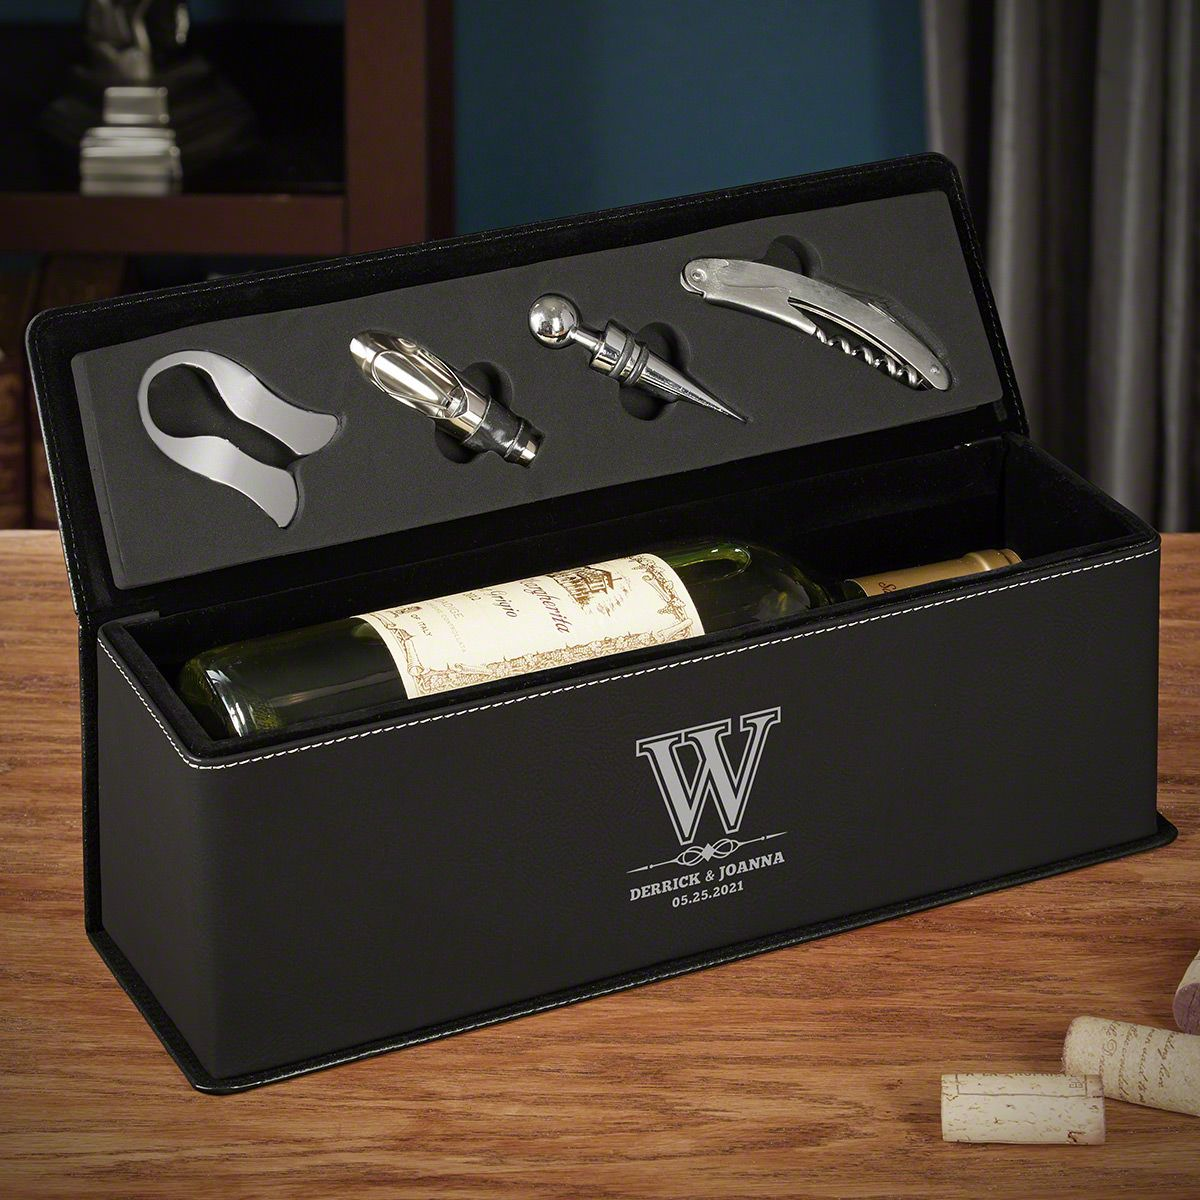 Lyndhurst Personalized Black Leather Wine Gift Box